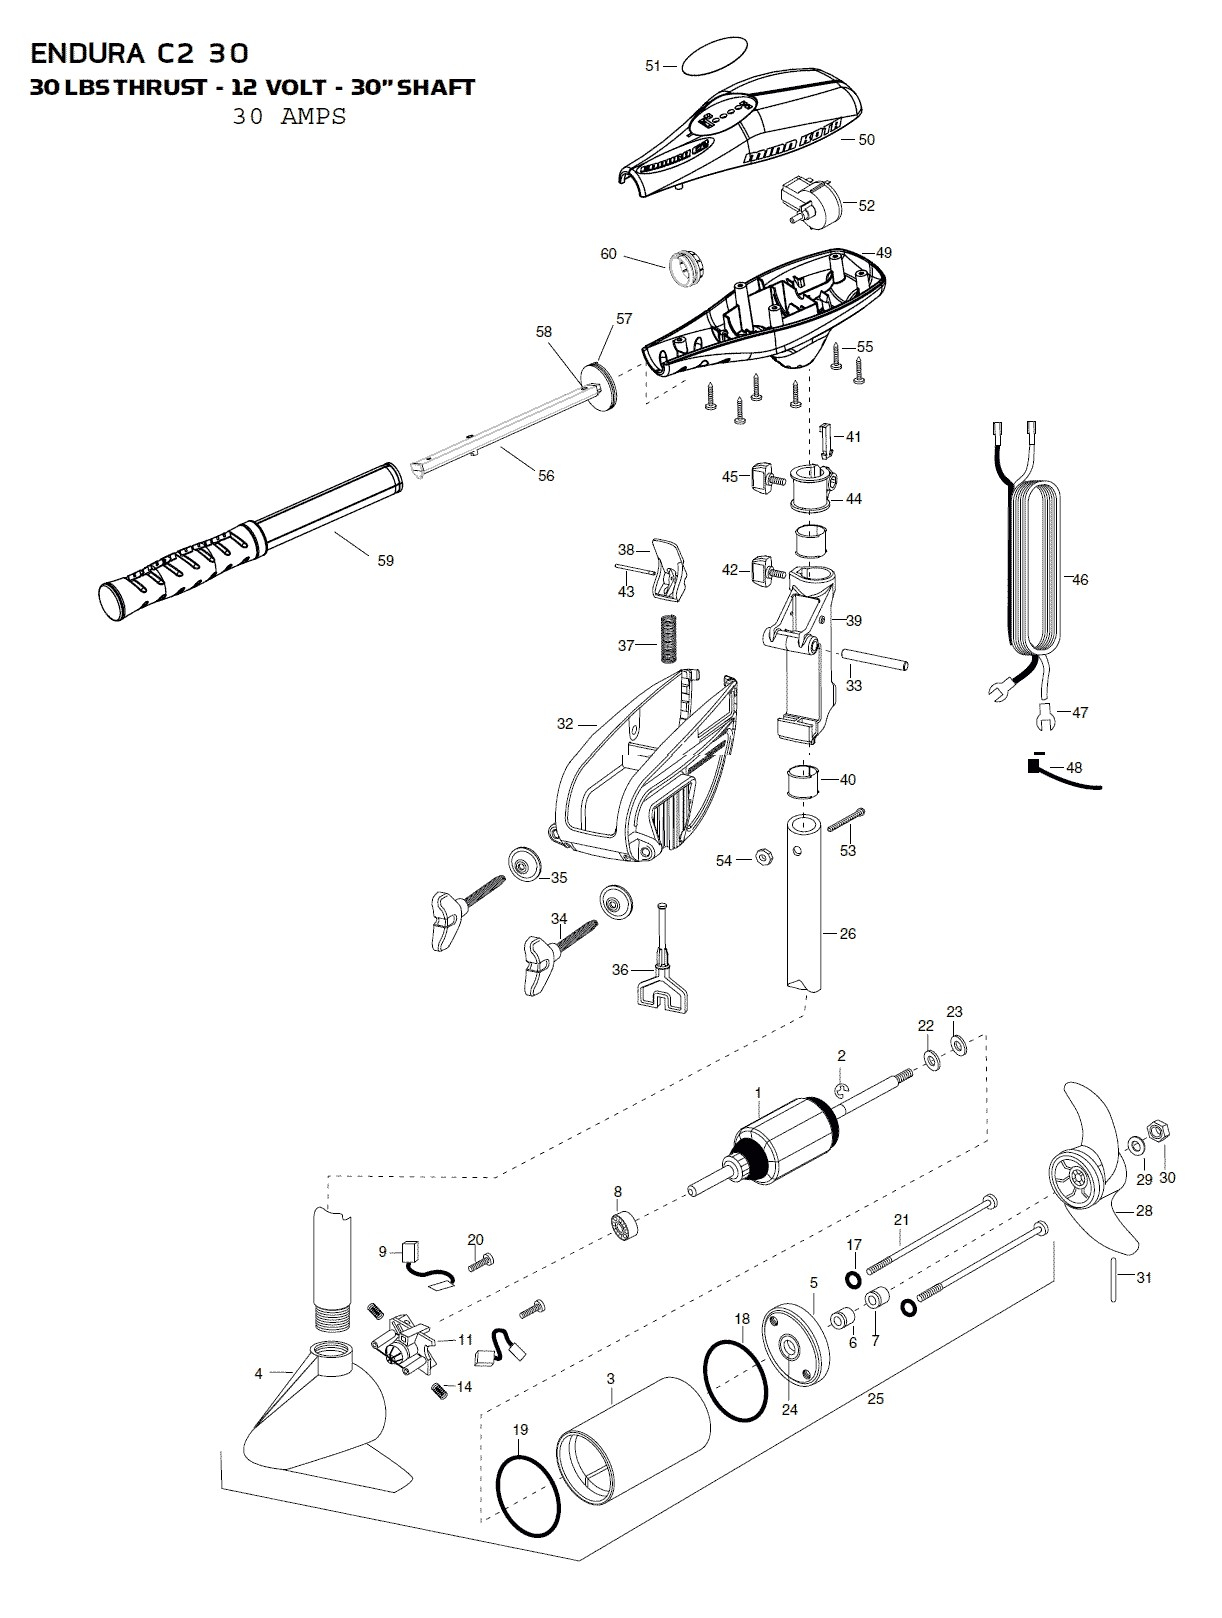 minn kota wiring diagram manual Collection-minn kota wiring diagram manual inspirational minn kota endura c2 30 parts 2015 from fish307 of minn kota wiring diagram manual 14-f